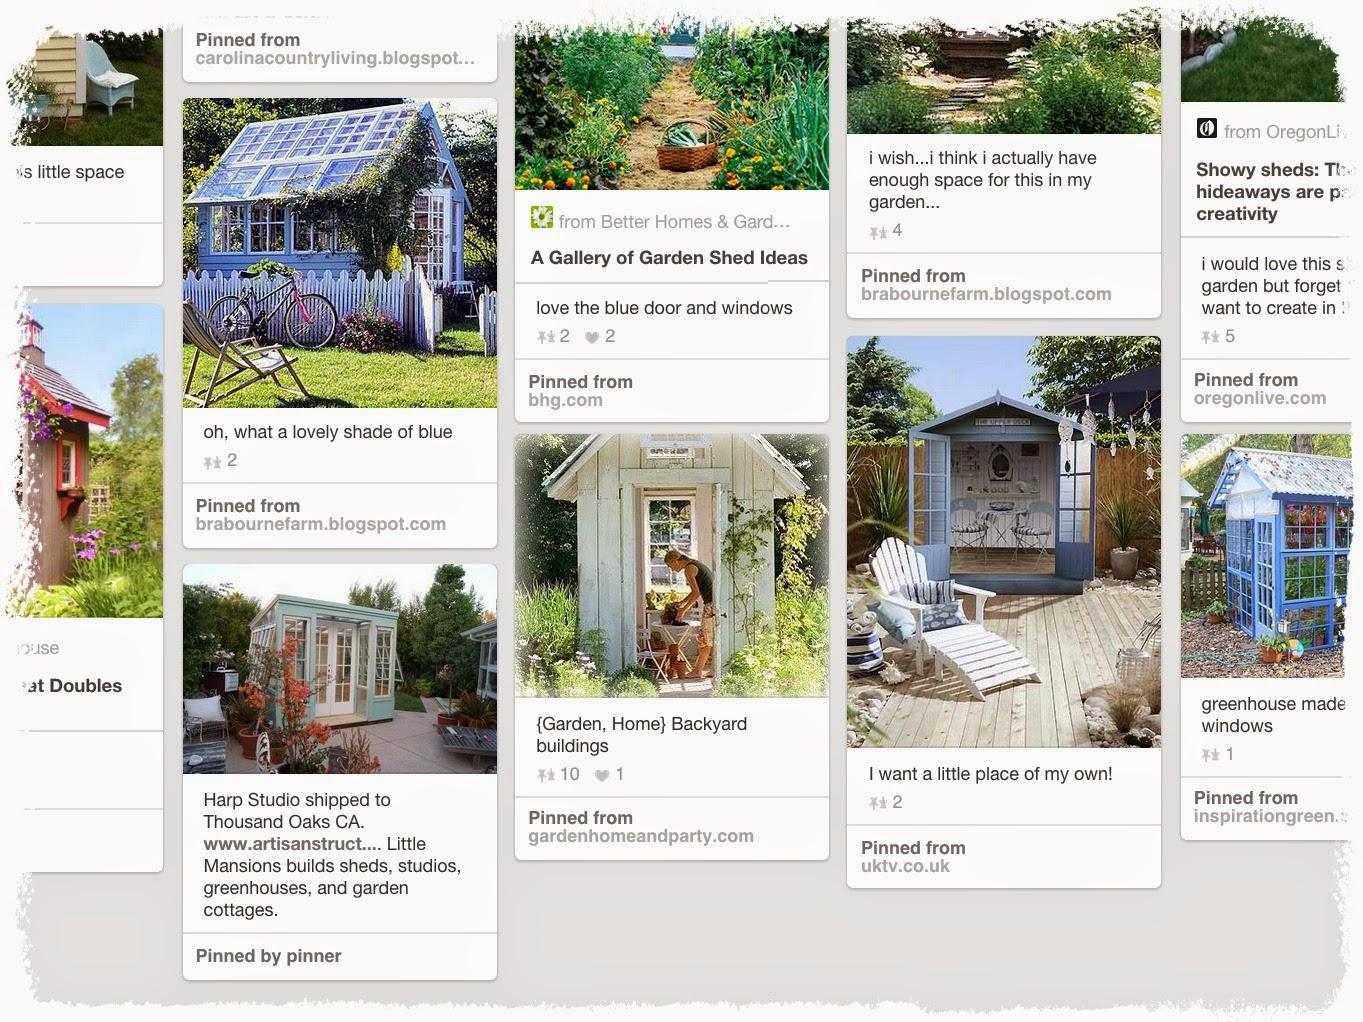 Little garden house - But I Finally Have My Own Little Garden House